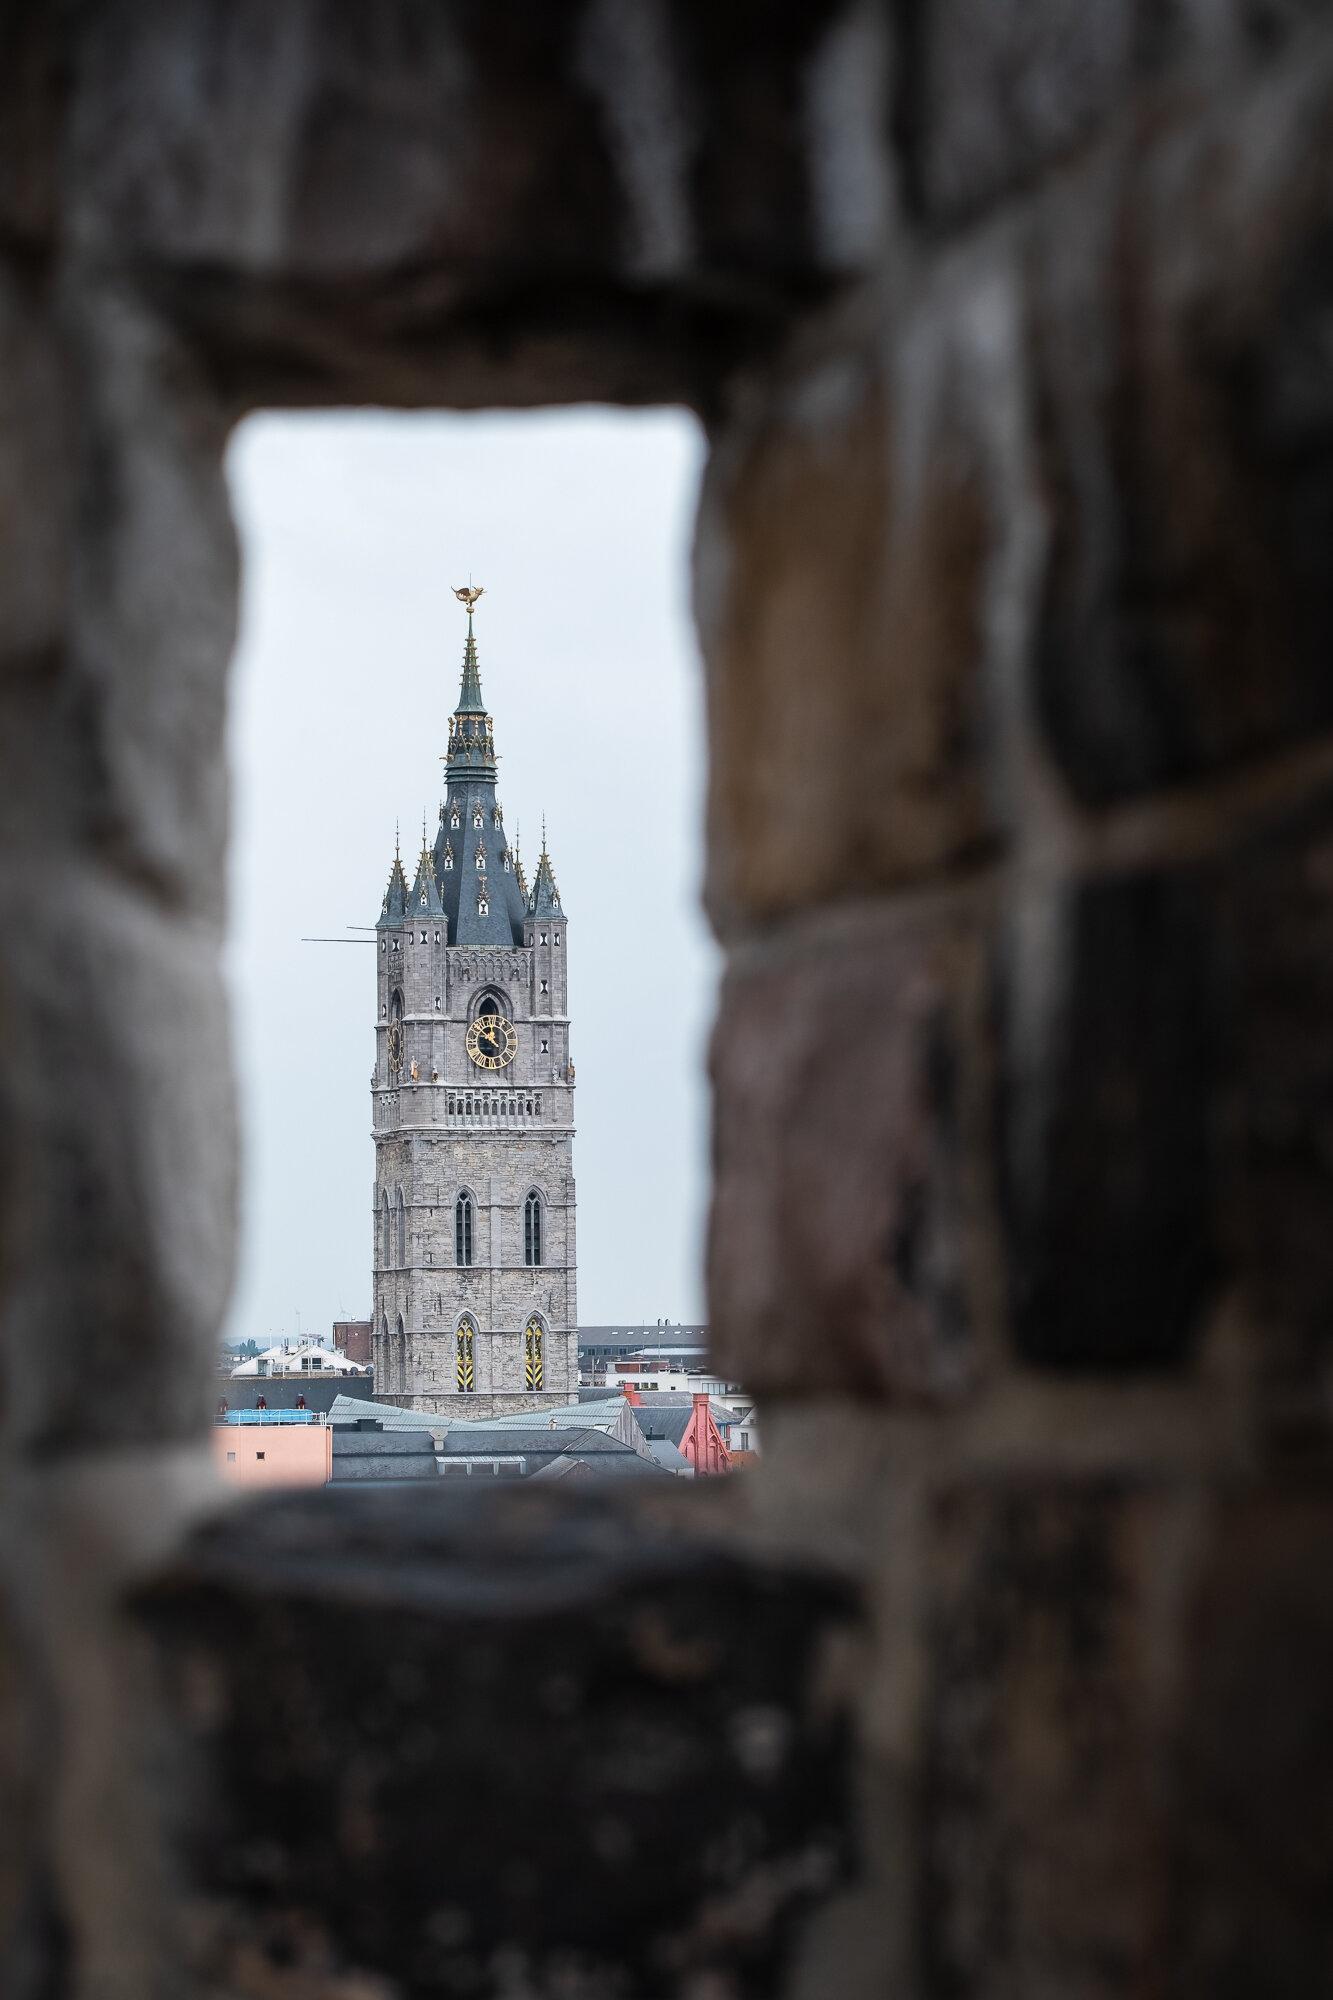 The Belfry of Ghent taken from Gravensteen Castle